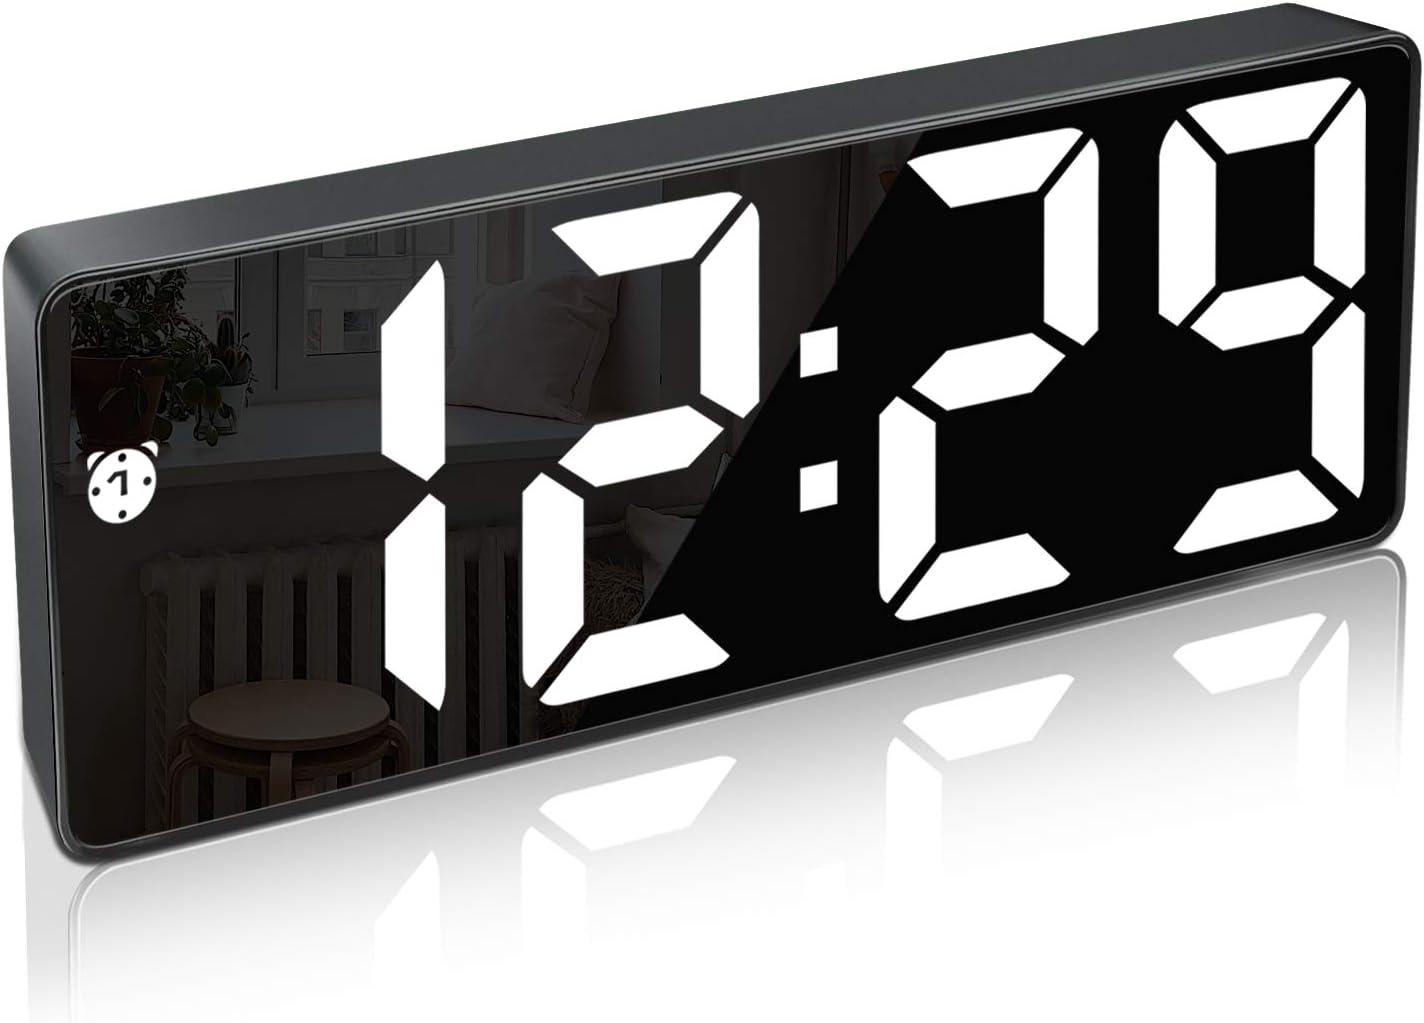 Reloj Despertador Digital,Pantalla LED de Números Grandes con Función de Repetición Brillo Cargador USB Despertador para Dormitorio Sala de Estar Oficina